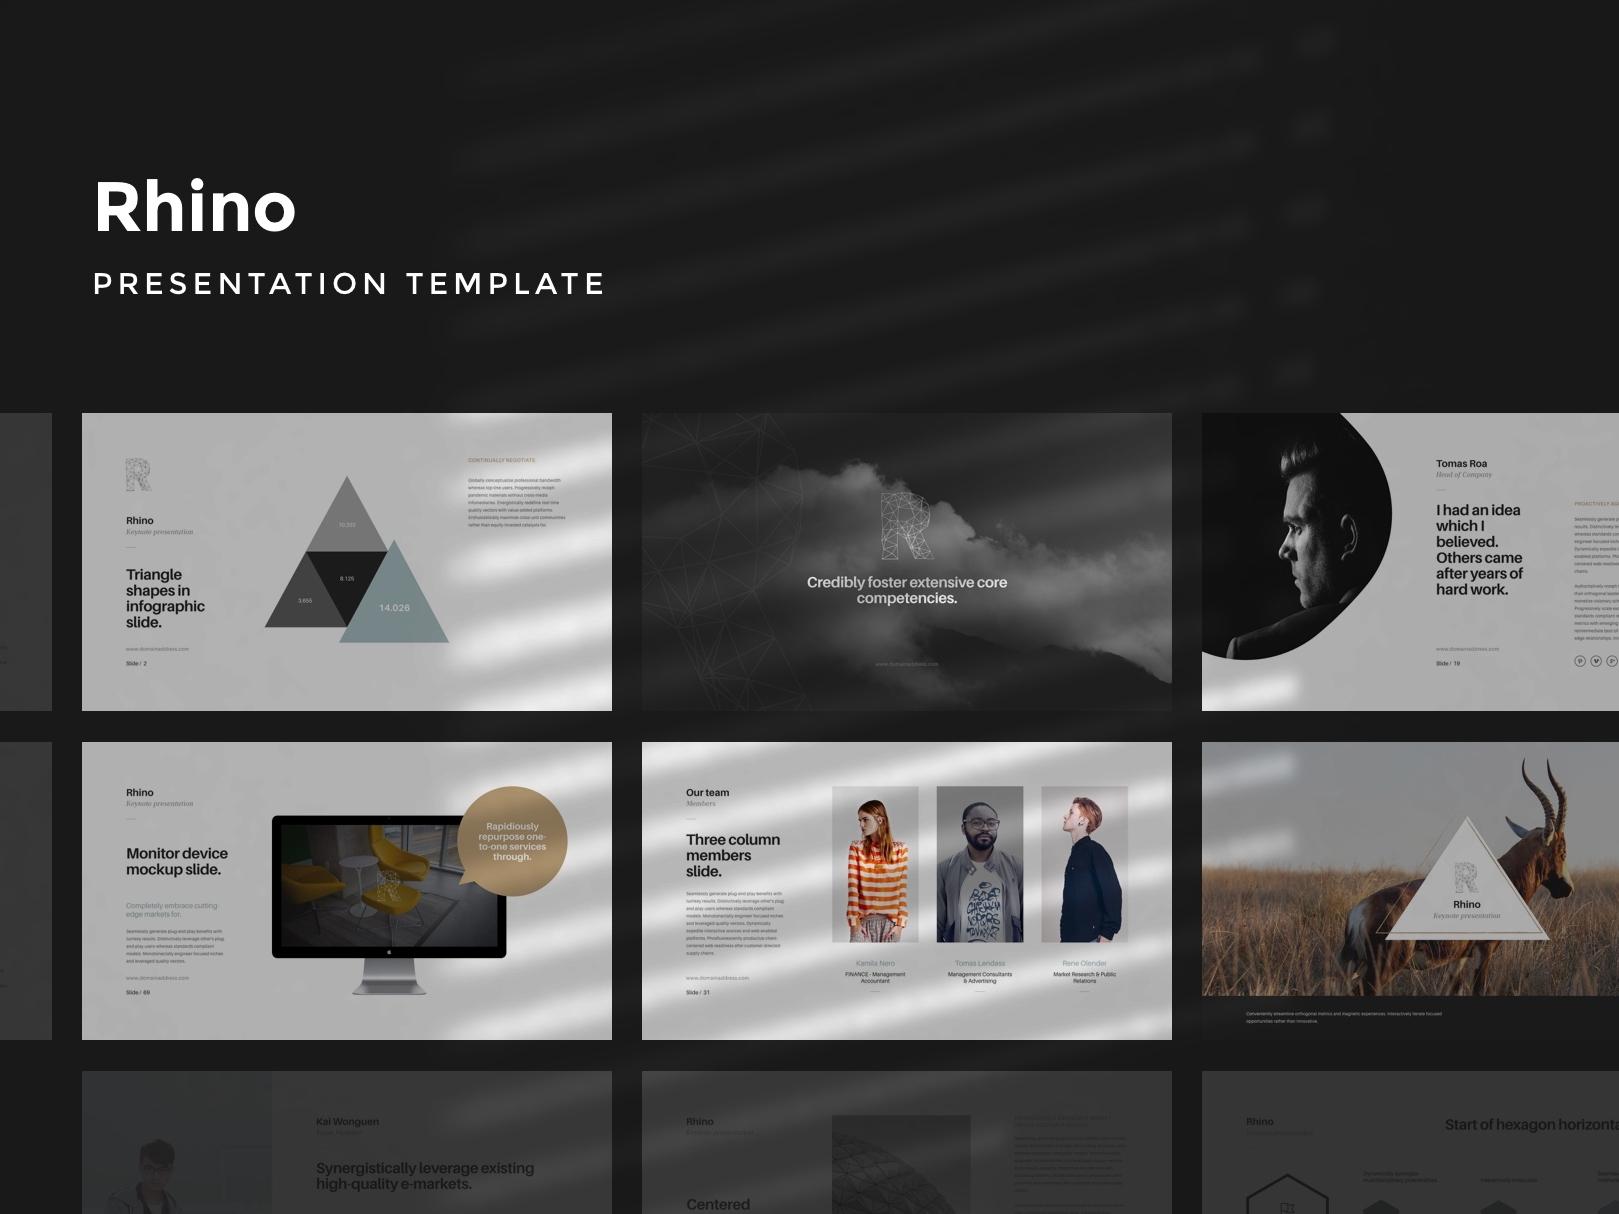 Rhino keynote presentation template by goashape cover